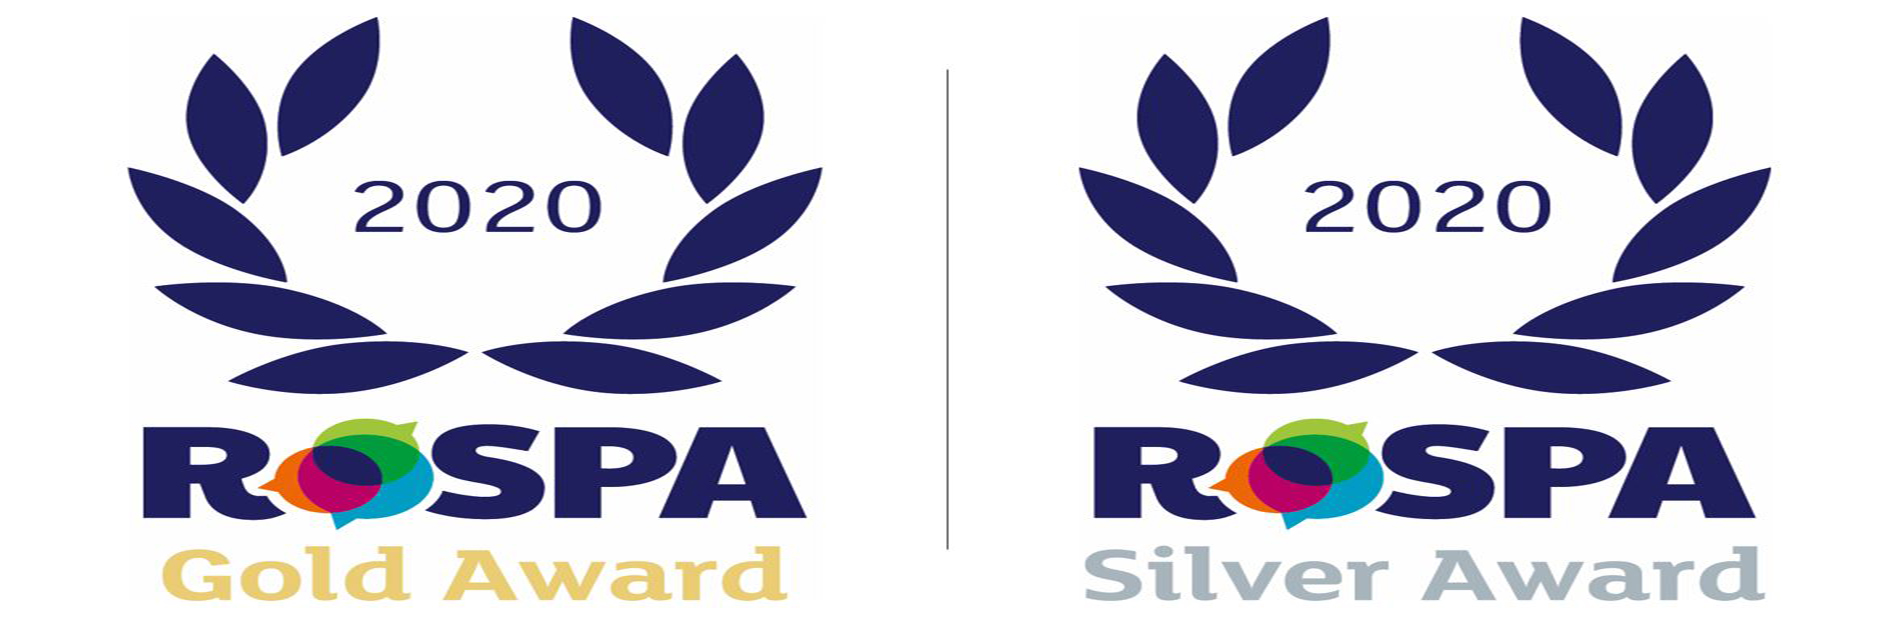 RoSPA Gold and Silver Awards 2020